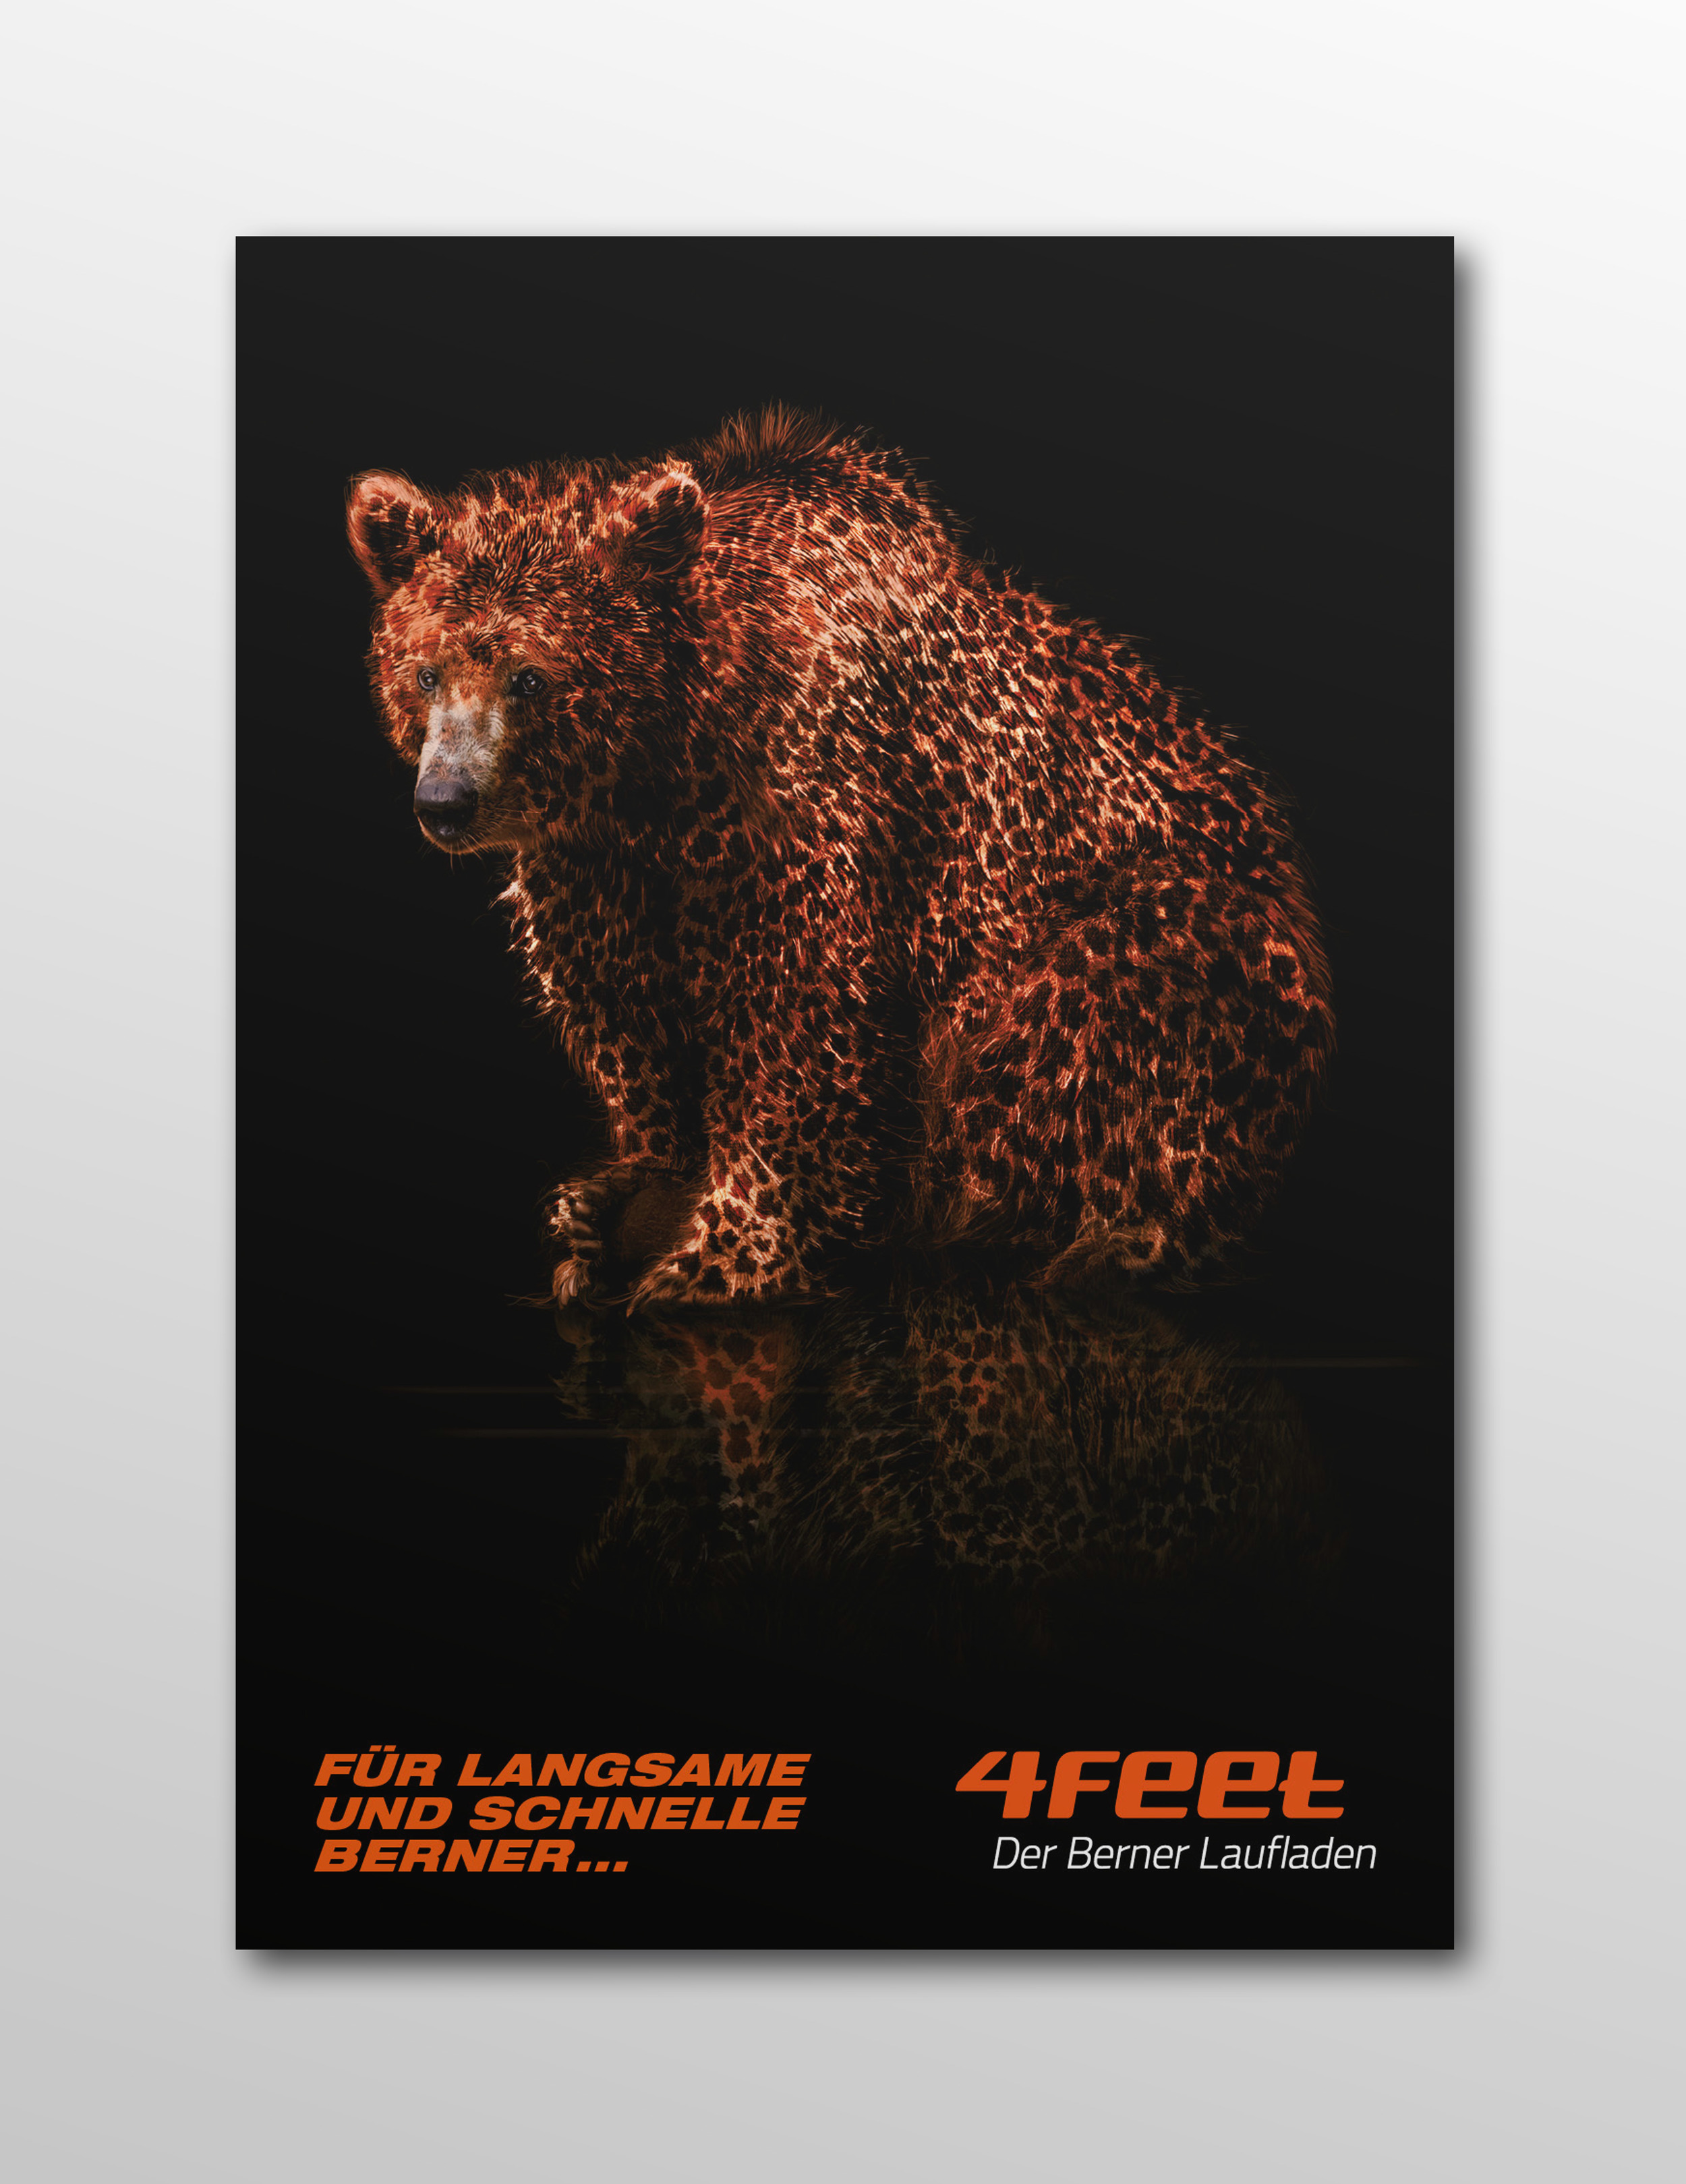 4feet Laufladen Bern, Keyvisual, Corporate, Kommunikation